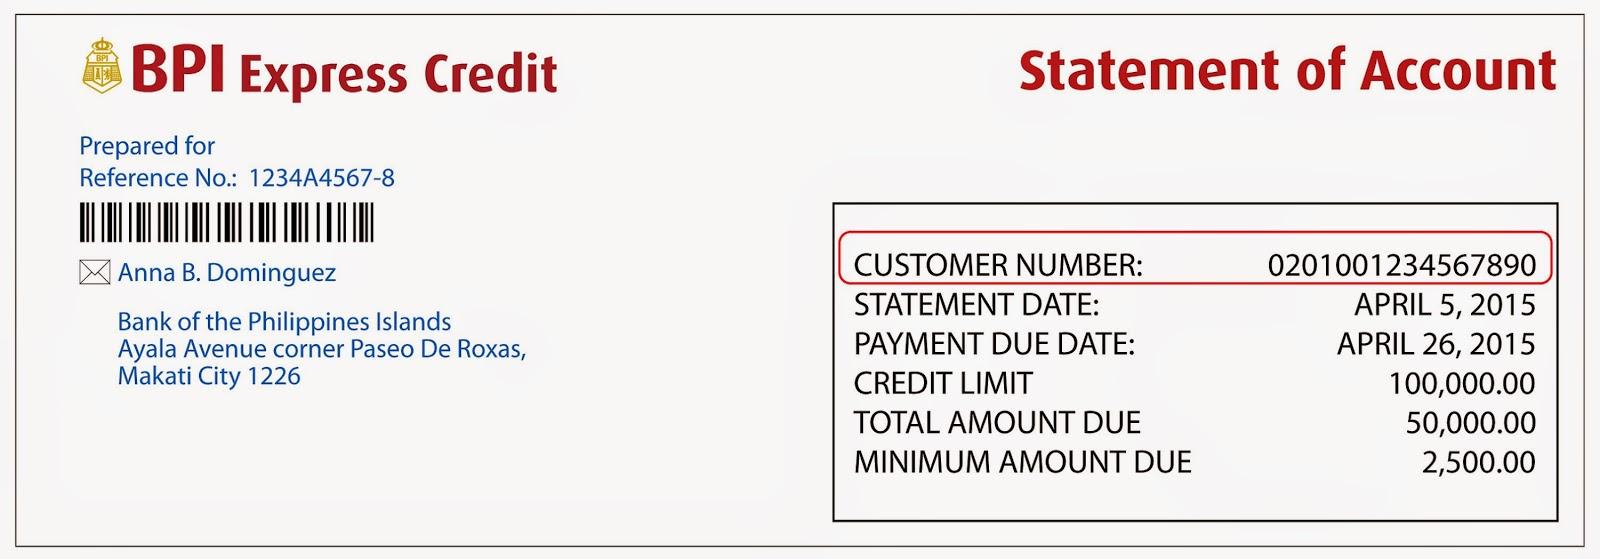 bpi credit card online statement